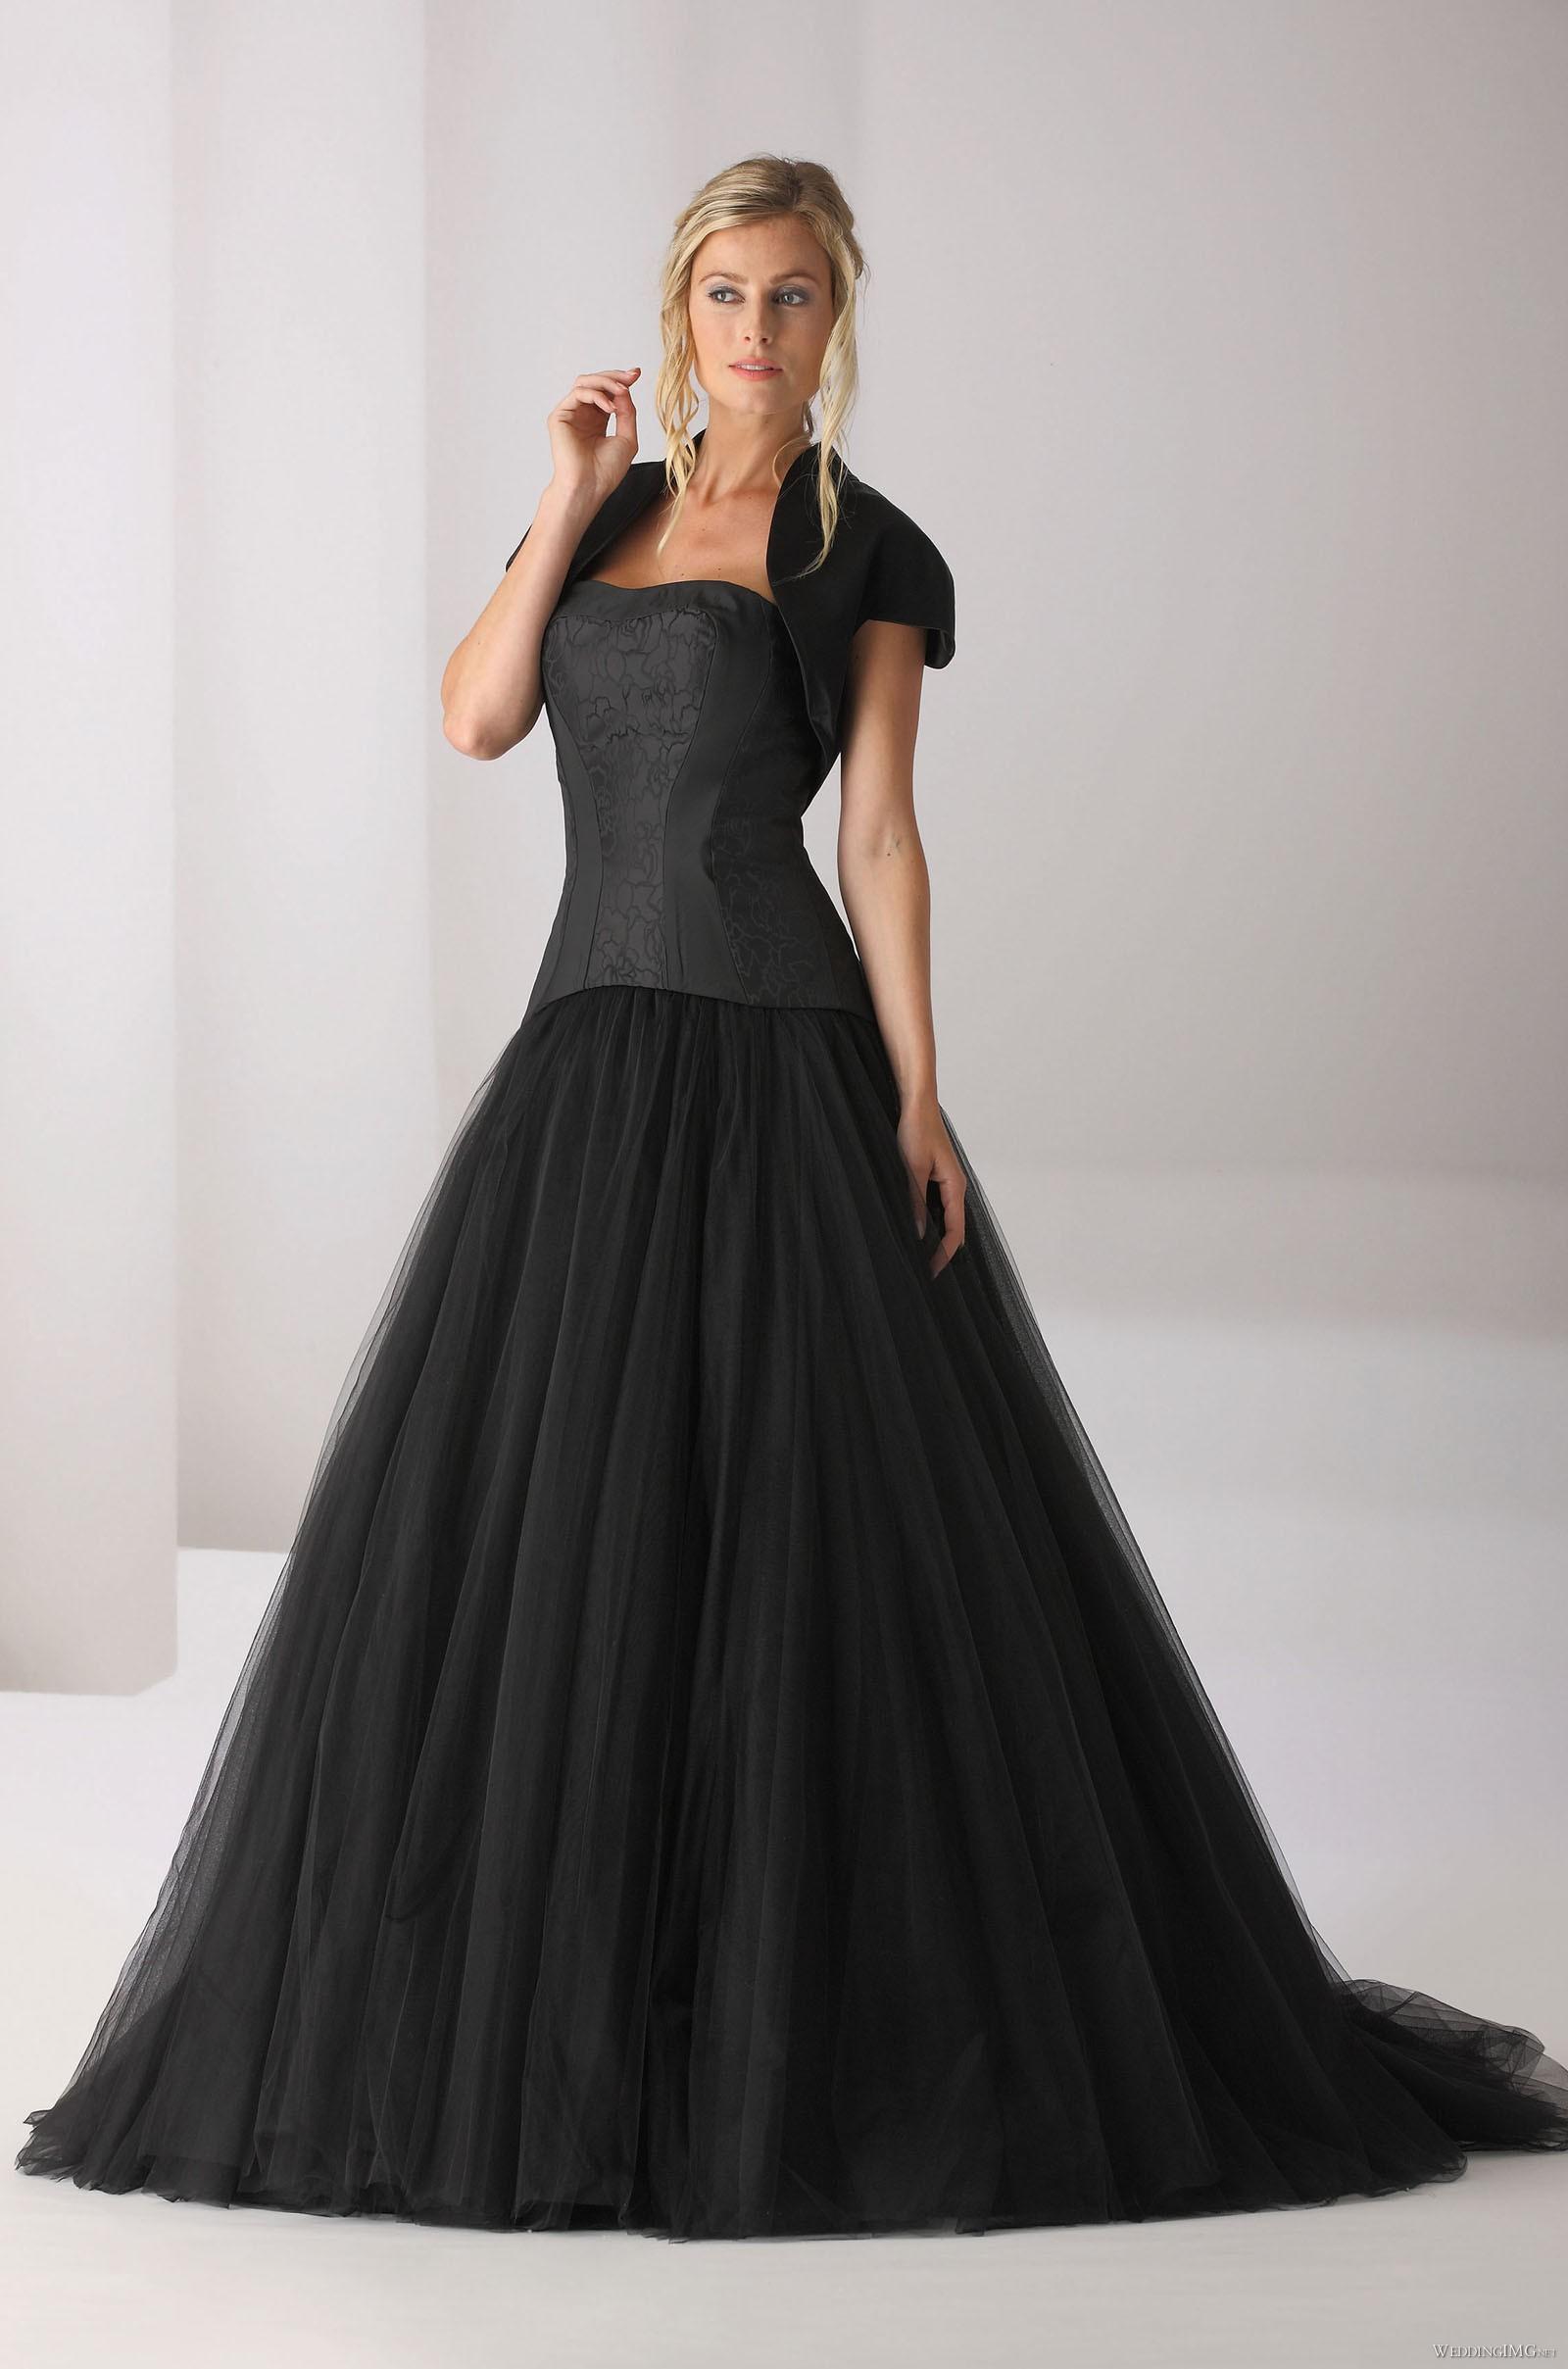 a097c1db96 Czarna suknia ślubna Affinity Bridal - Wedding.pl